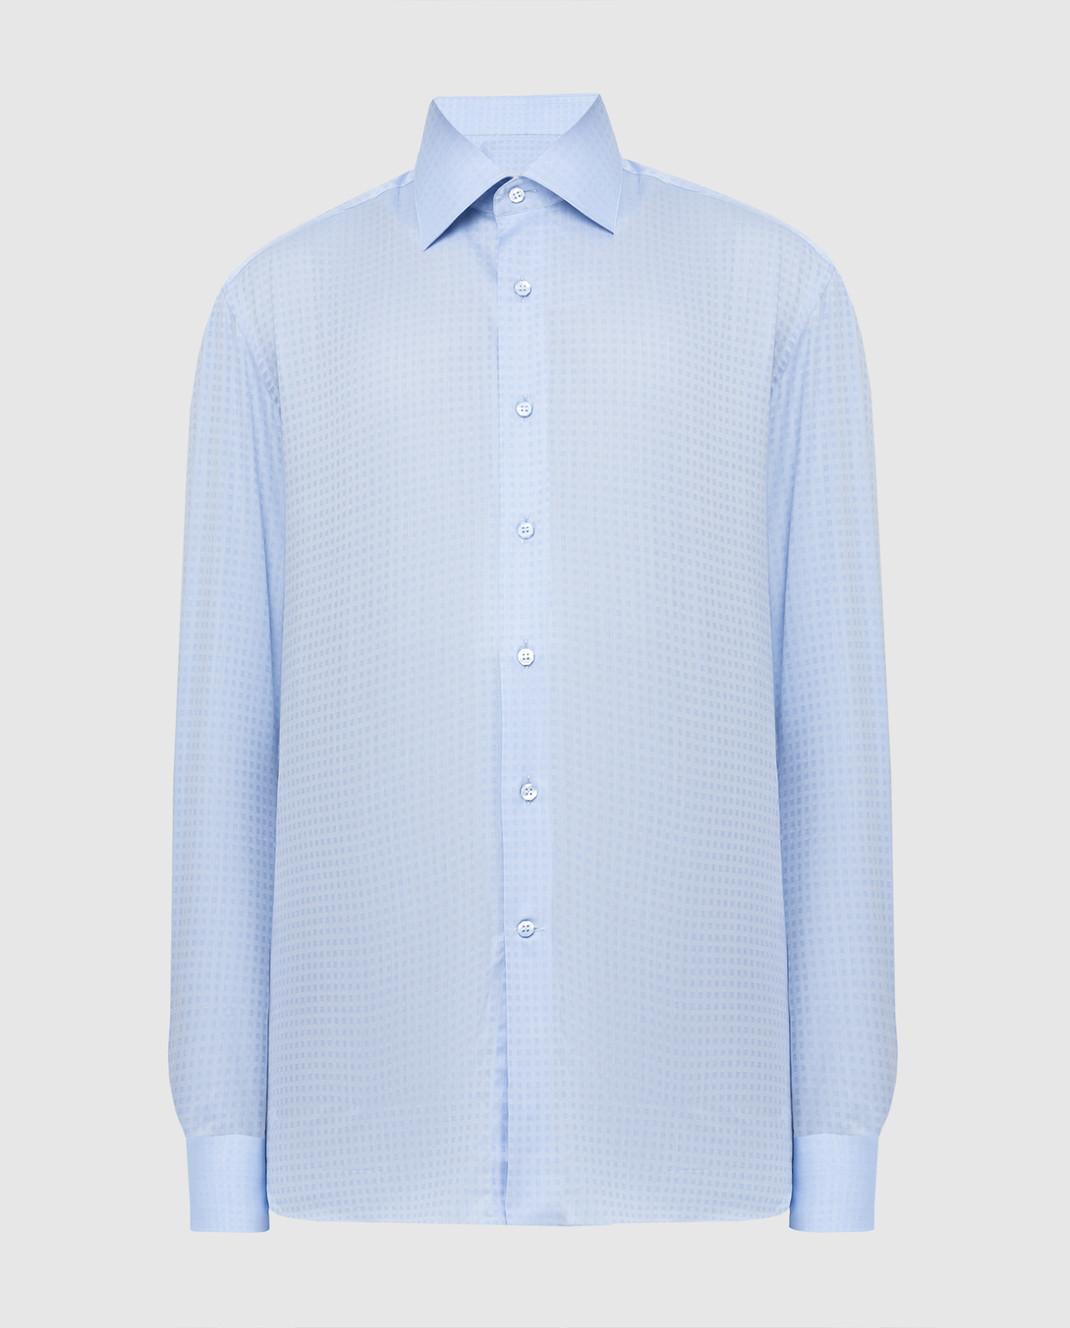 Stefano Ricci Голубая рубашка изображение 1